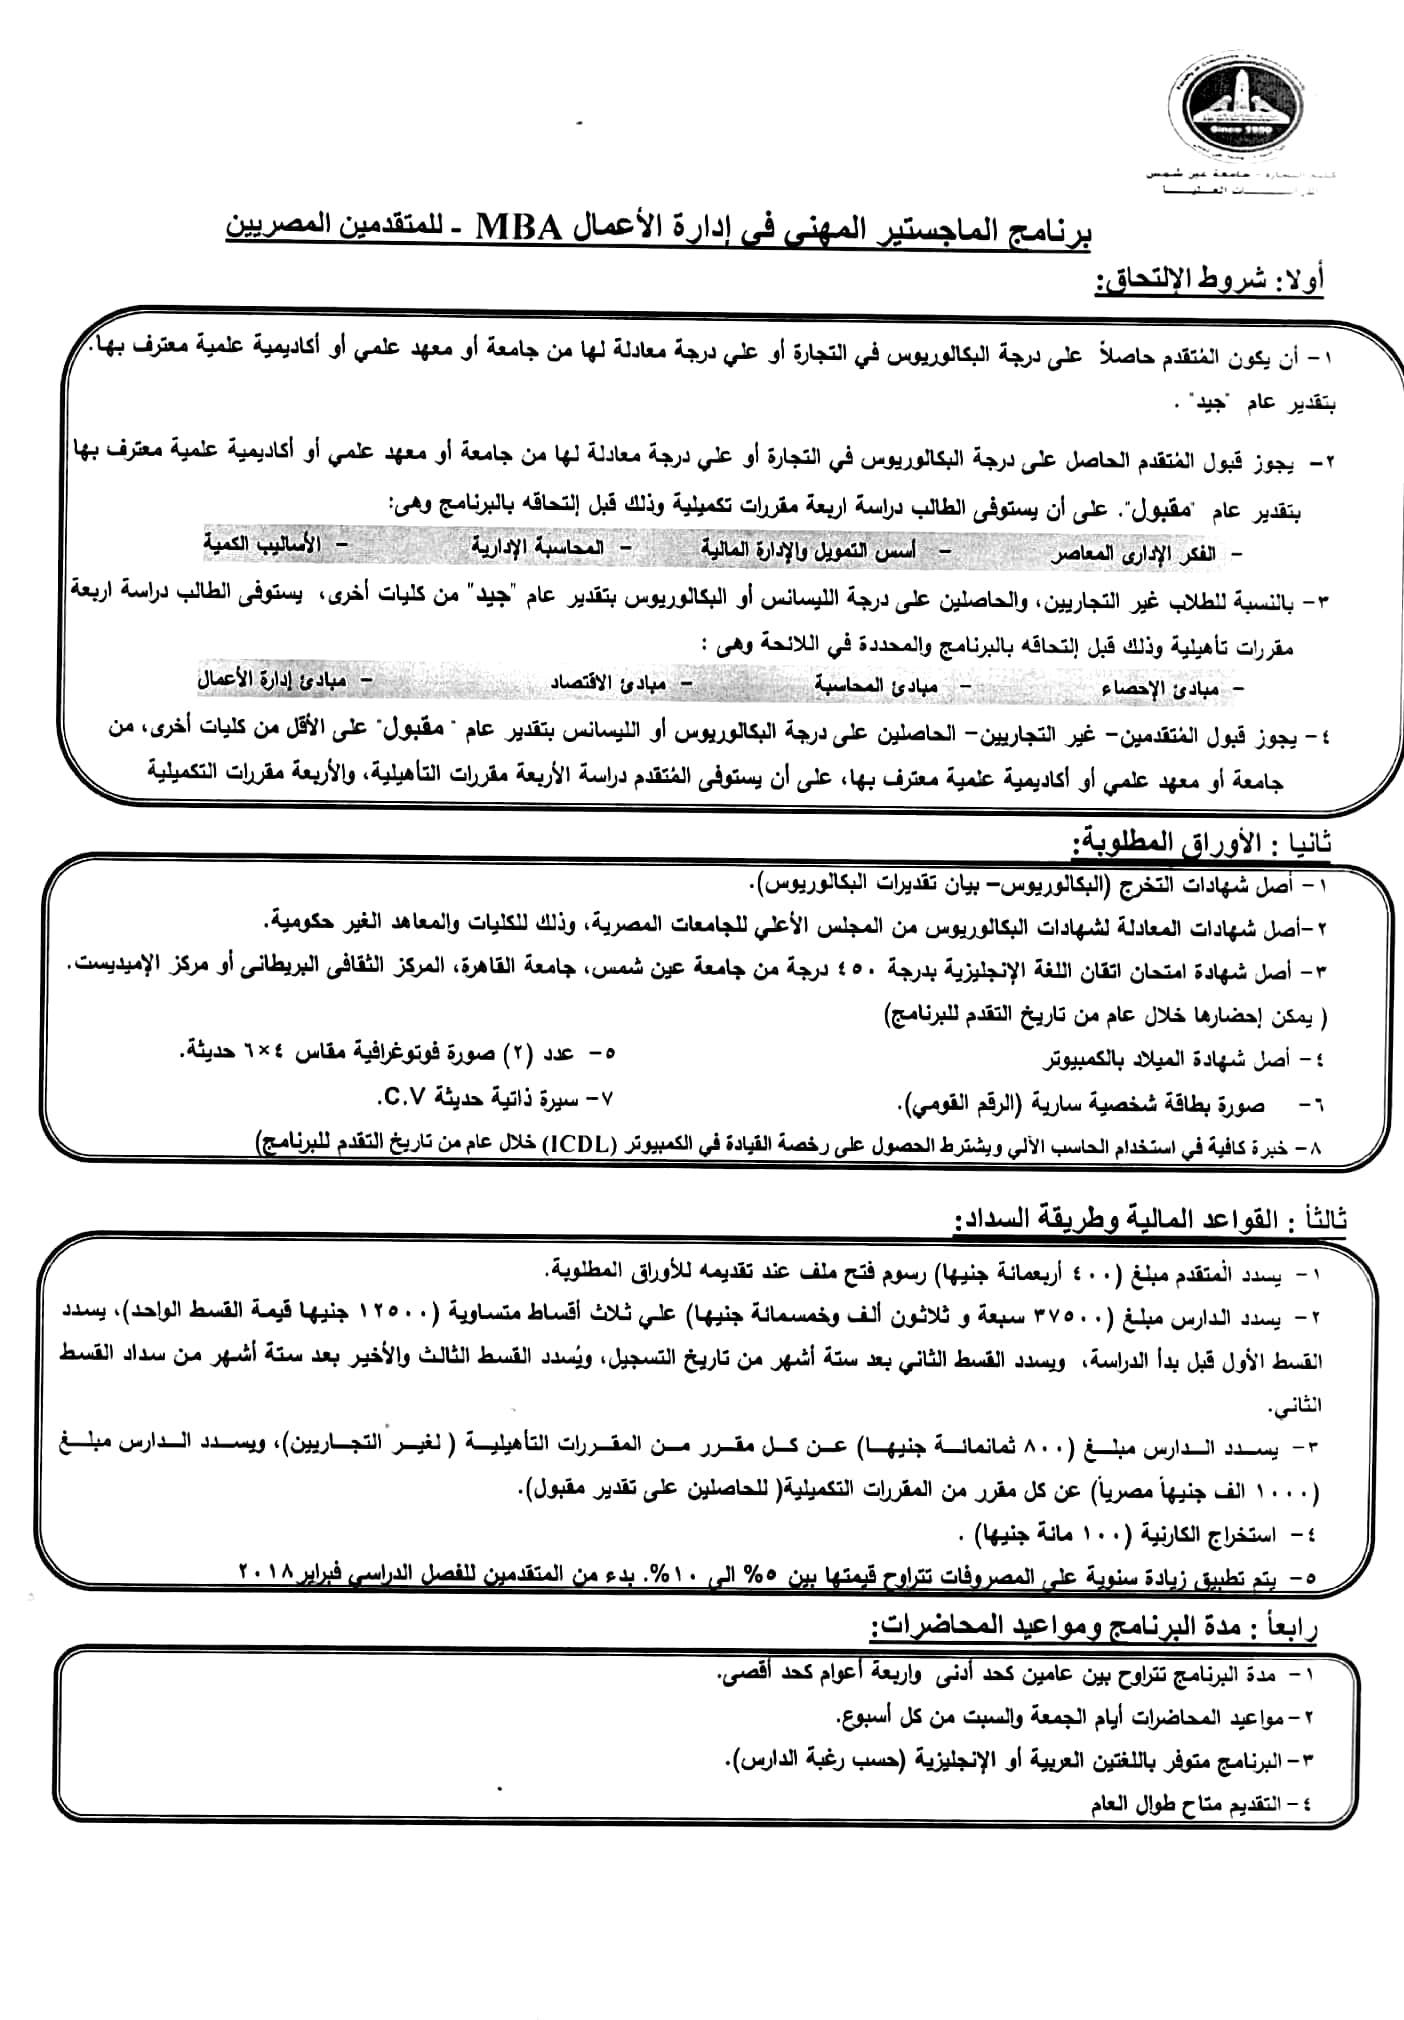 Photo of شروط الماجستير المهني MBA جامعة عين شمس وطريقة التقديم 2017